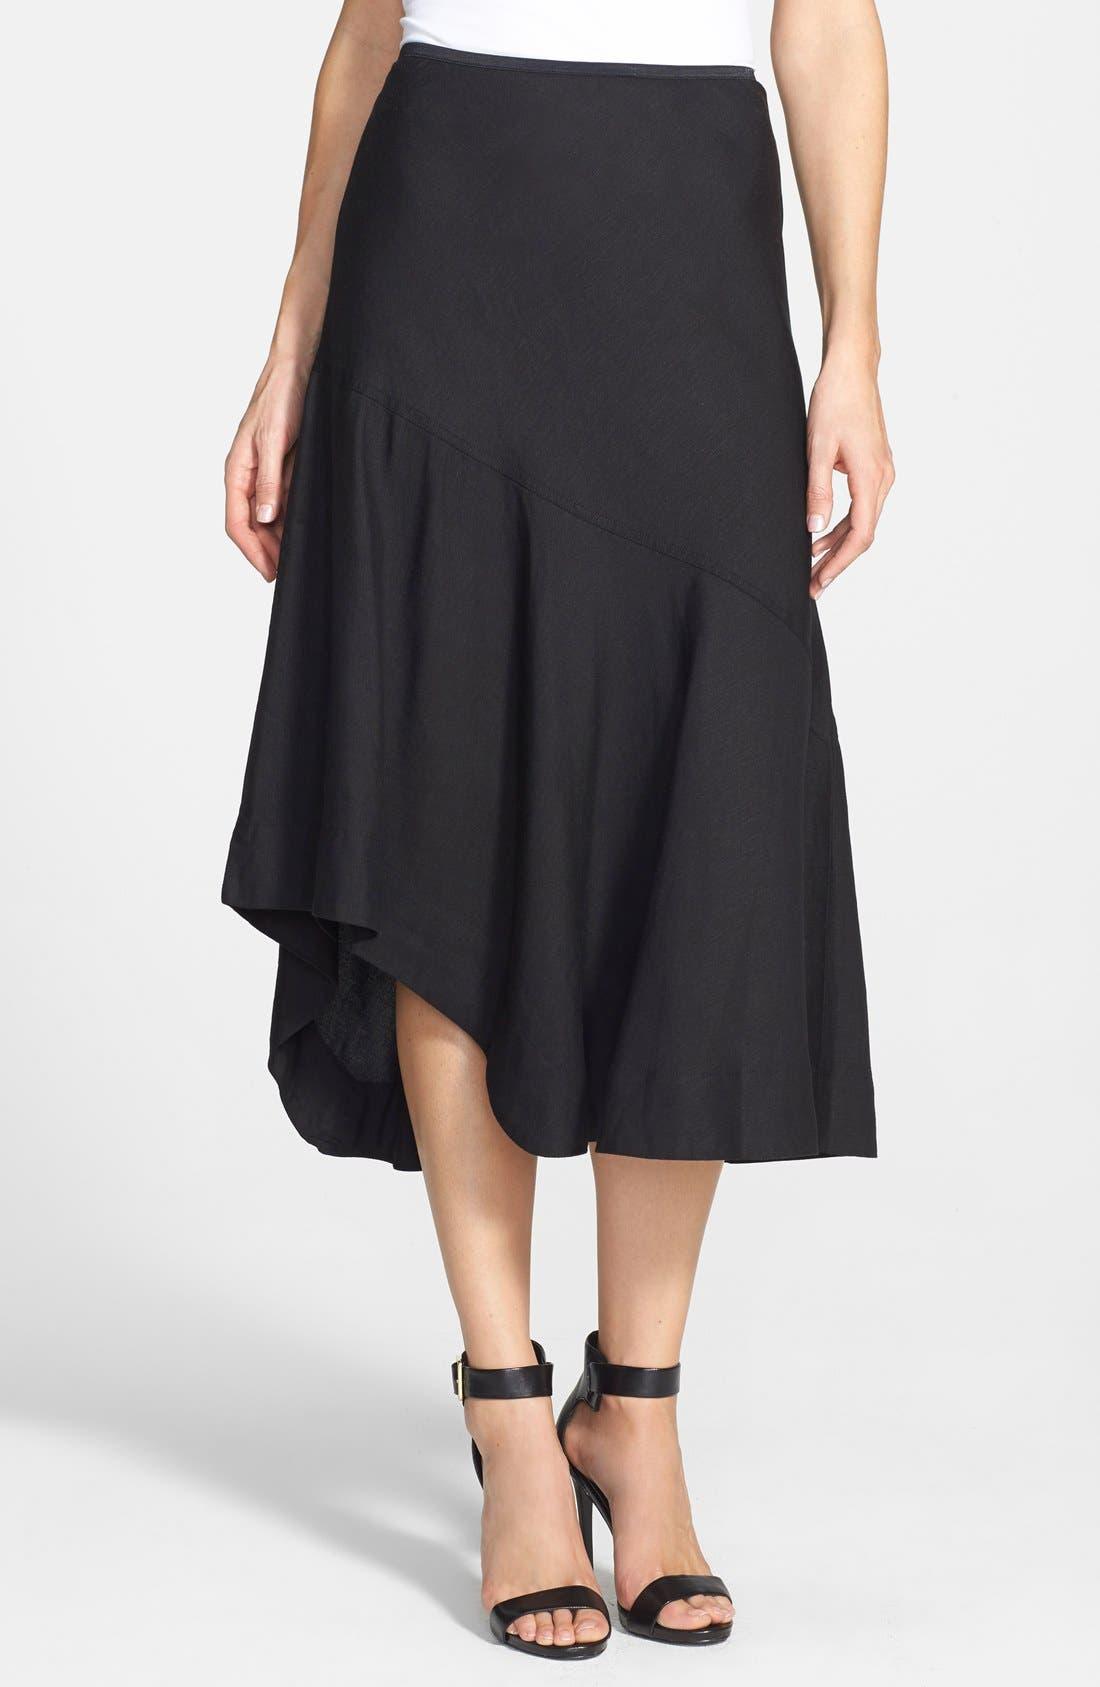 NIC+ZOE 'The Long Engagement' Midi Skirt, Main, color, 004